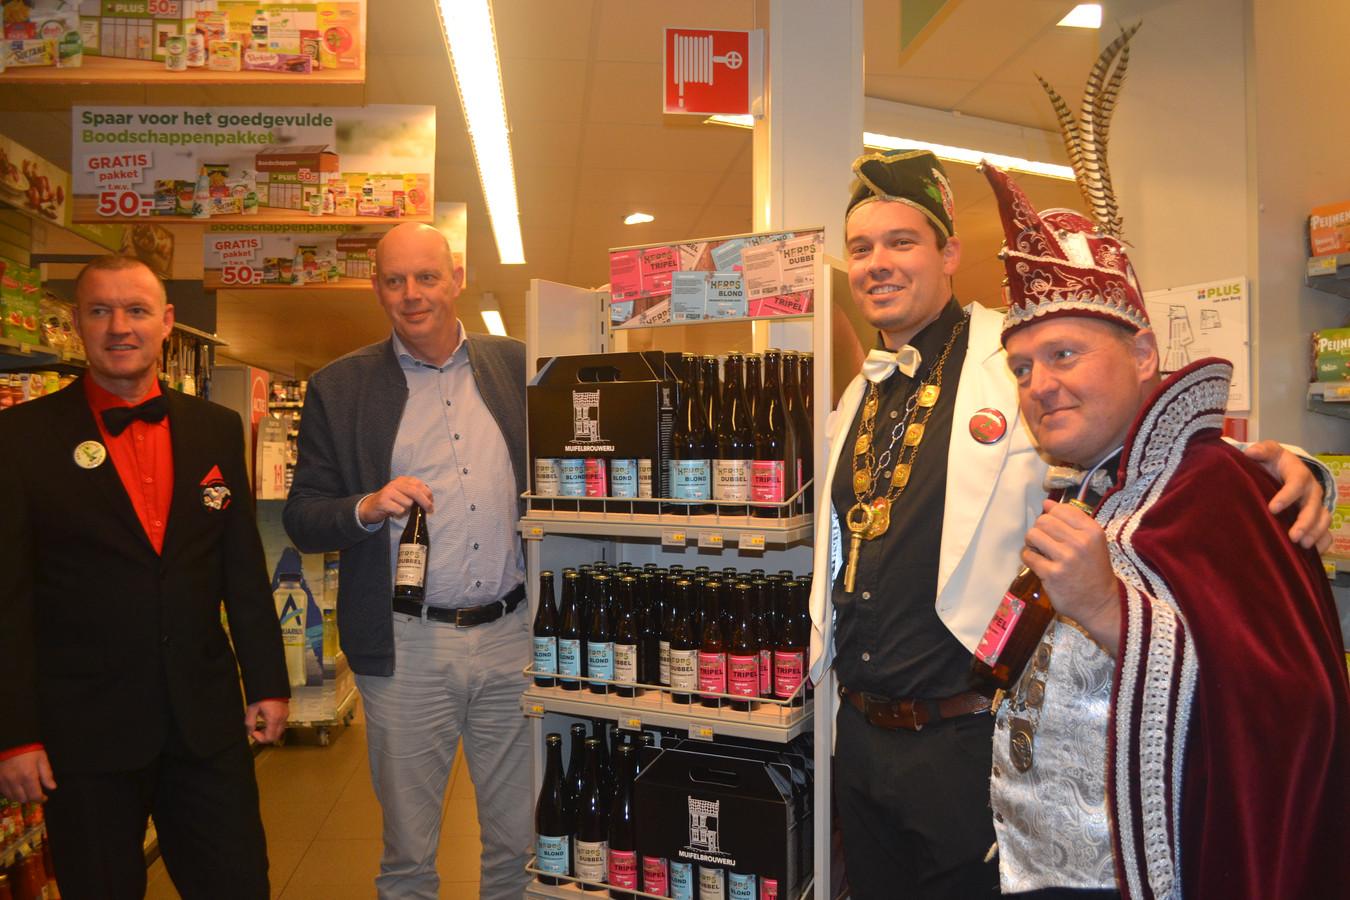 Herps Bier gepresenteerd door Geston Westrek, Wil Koopmans, burgemester Stan en Prins Frans Jan 1.